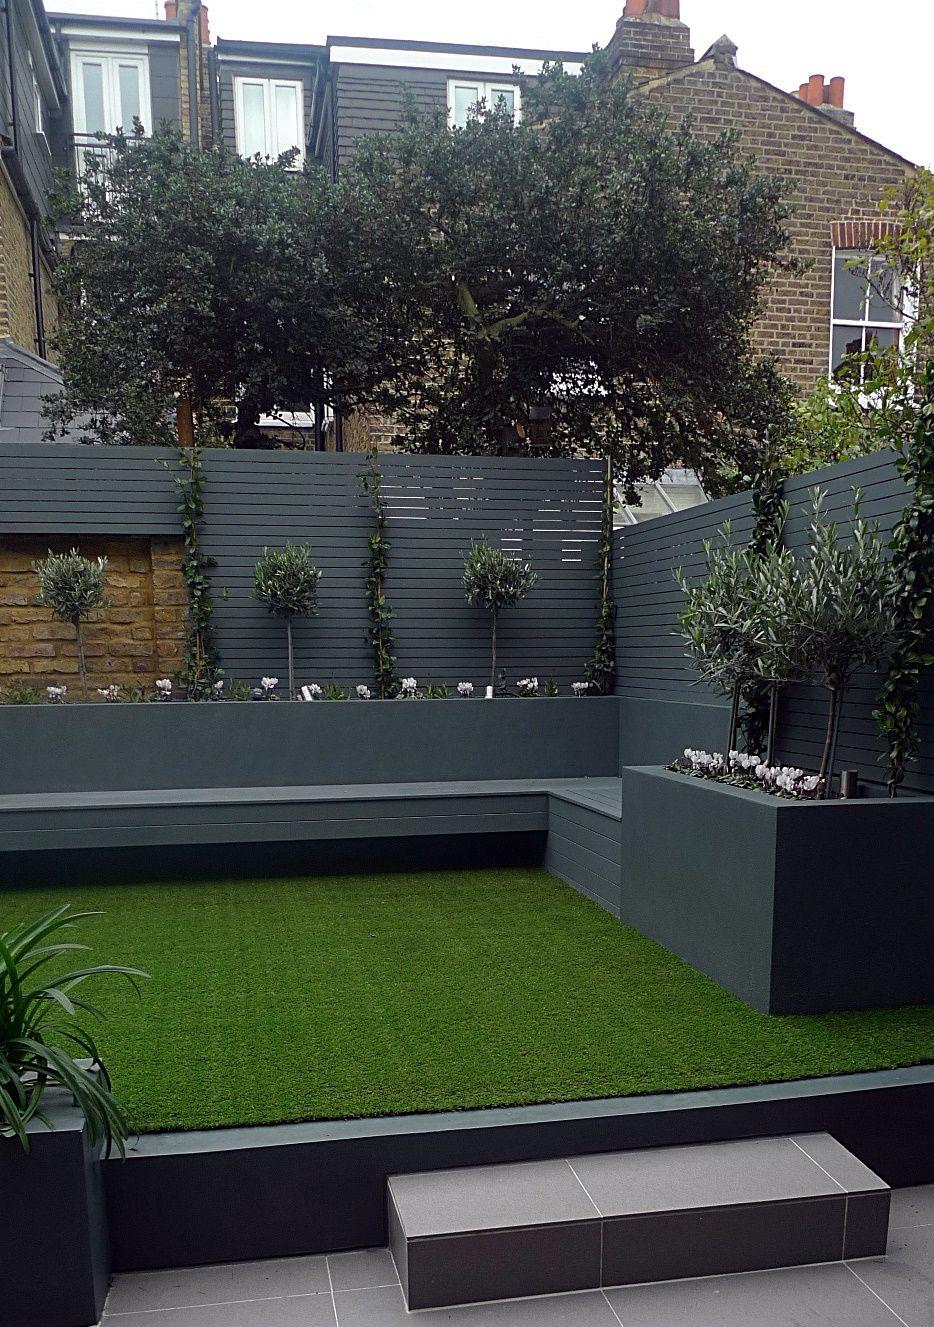 London Garden Design Garden Design Part 6 Courtyard Gardens Design Small Courtyard Gardens Small Backyard Landscaping